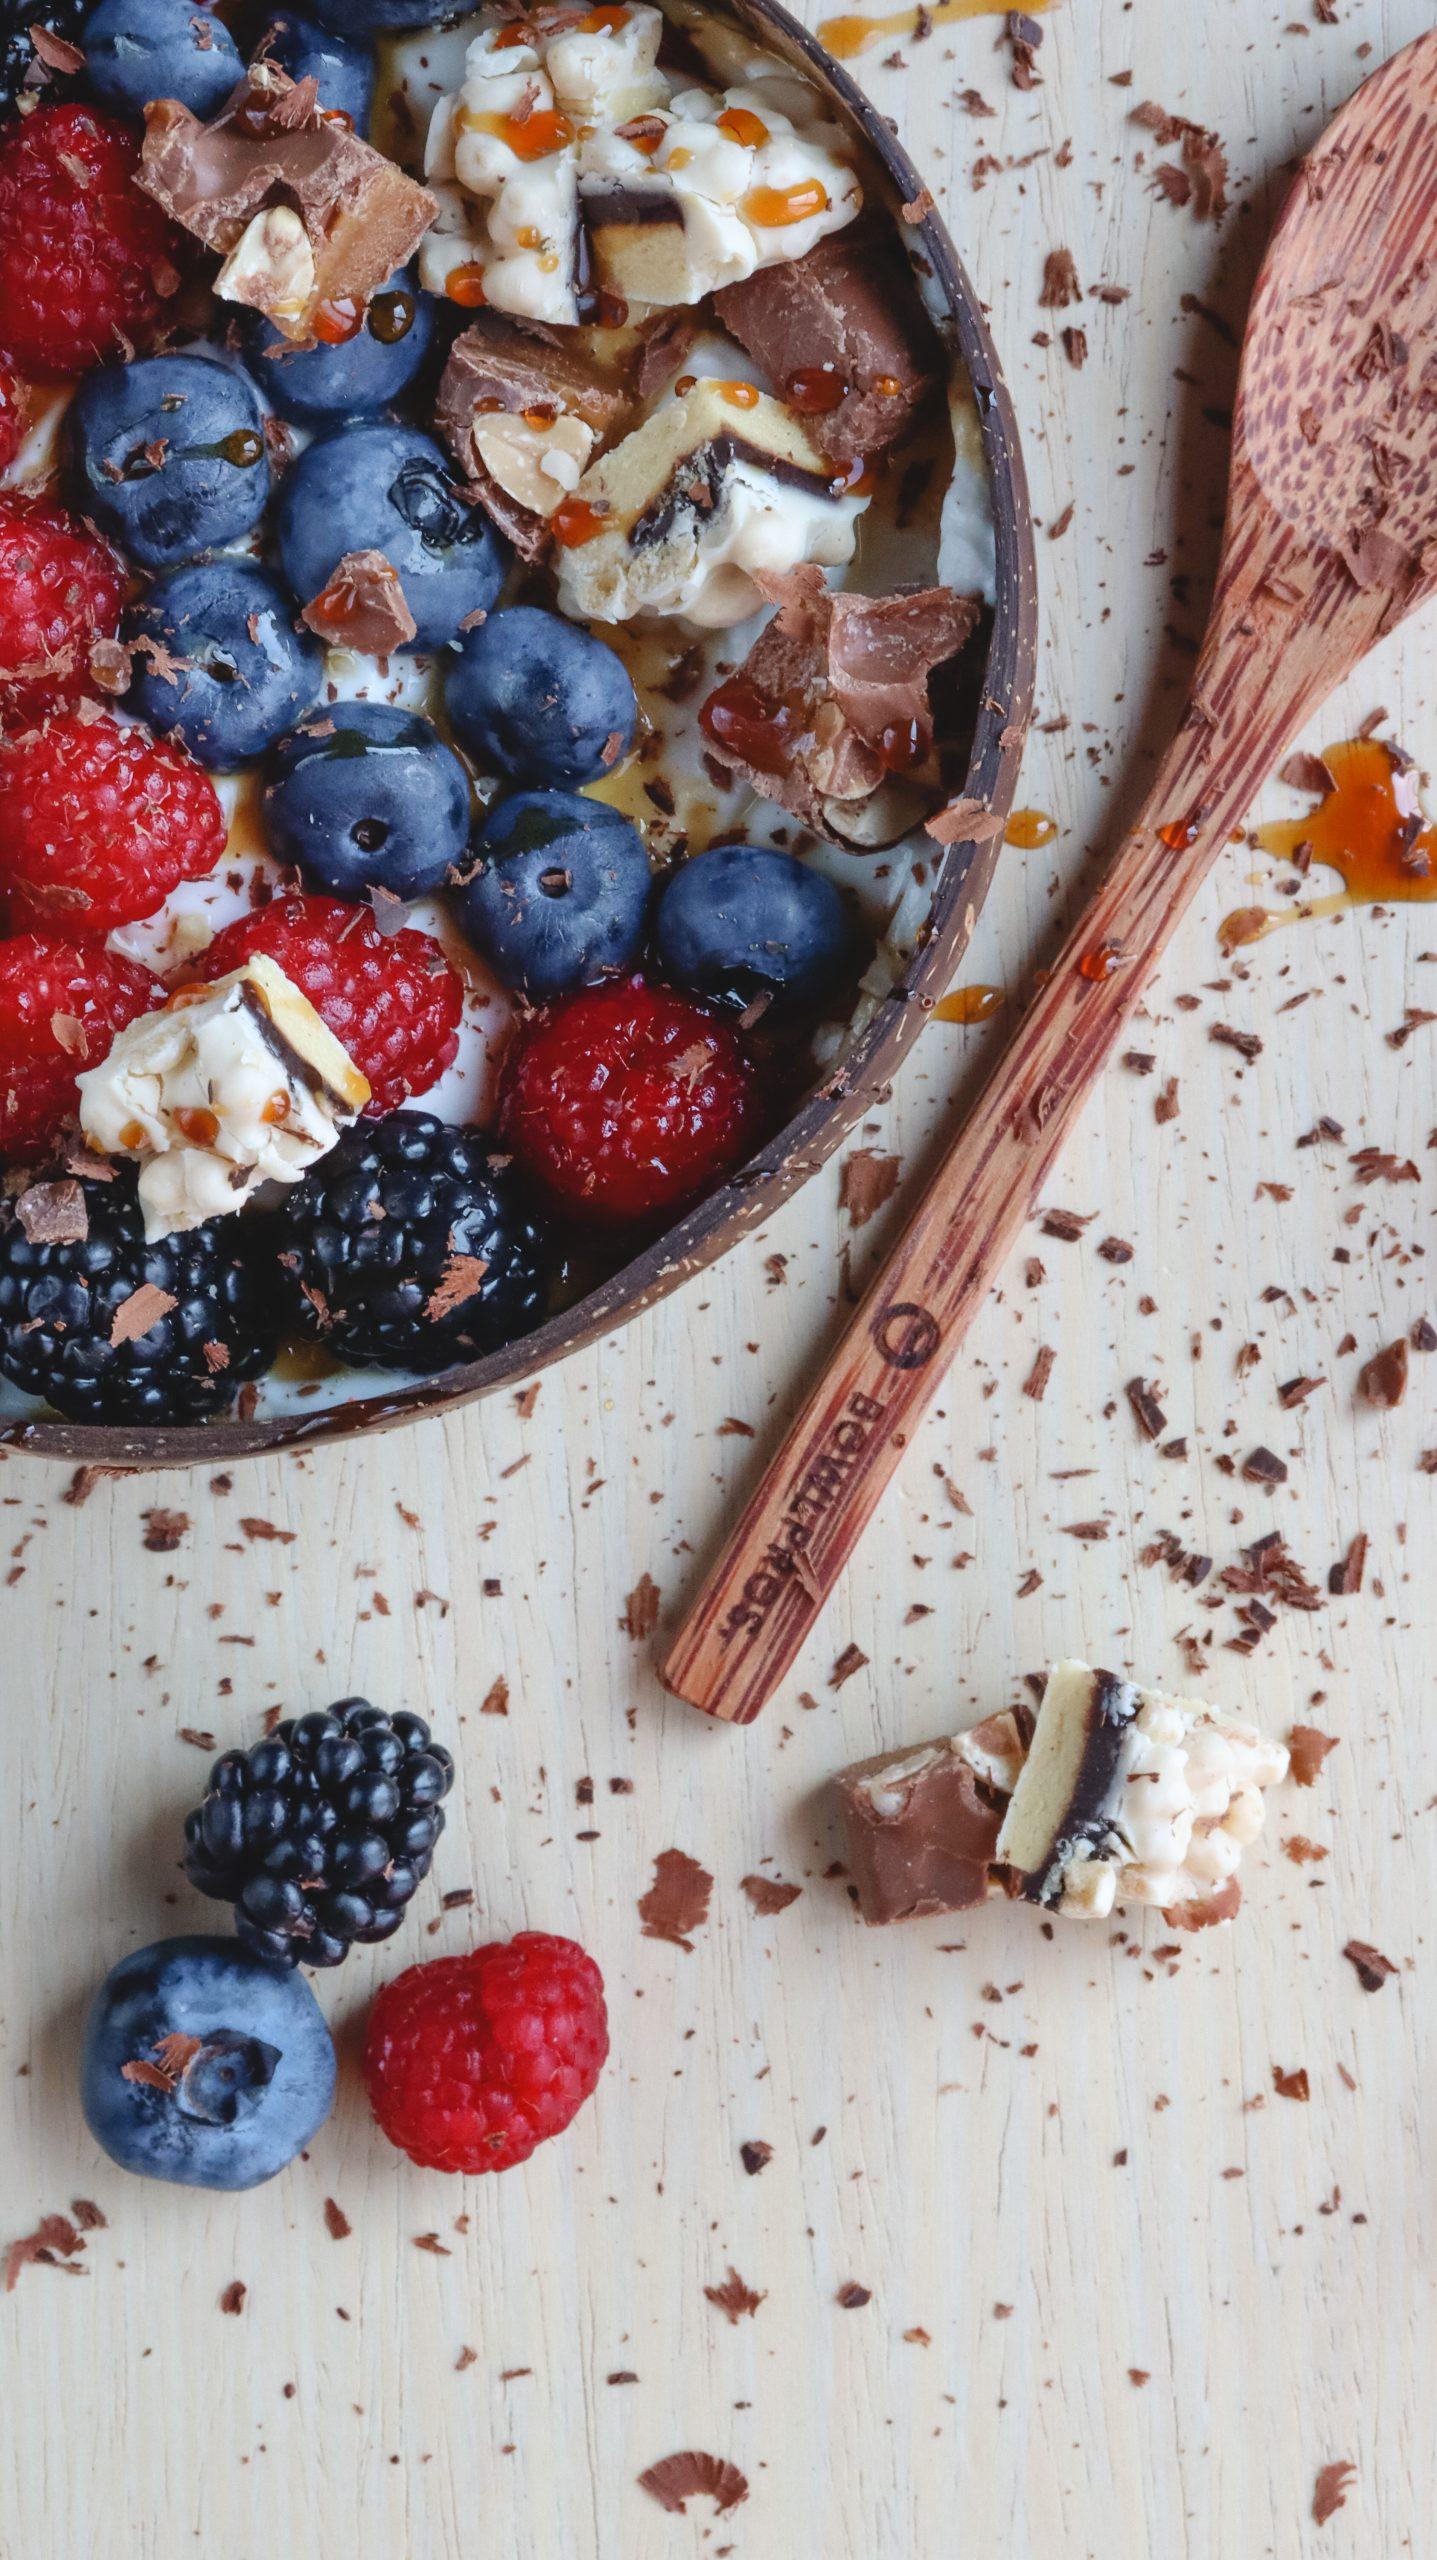 #iamfitandsweet #fitandsweet #bowl #fruitbowl #frutta #fitproteinbar #nu3 #foodinfluencer #foodblogger #foodbloggeritaliani #foodbloggermilano #foodinfluencer #monz